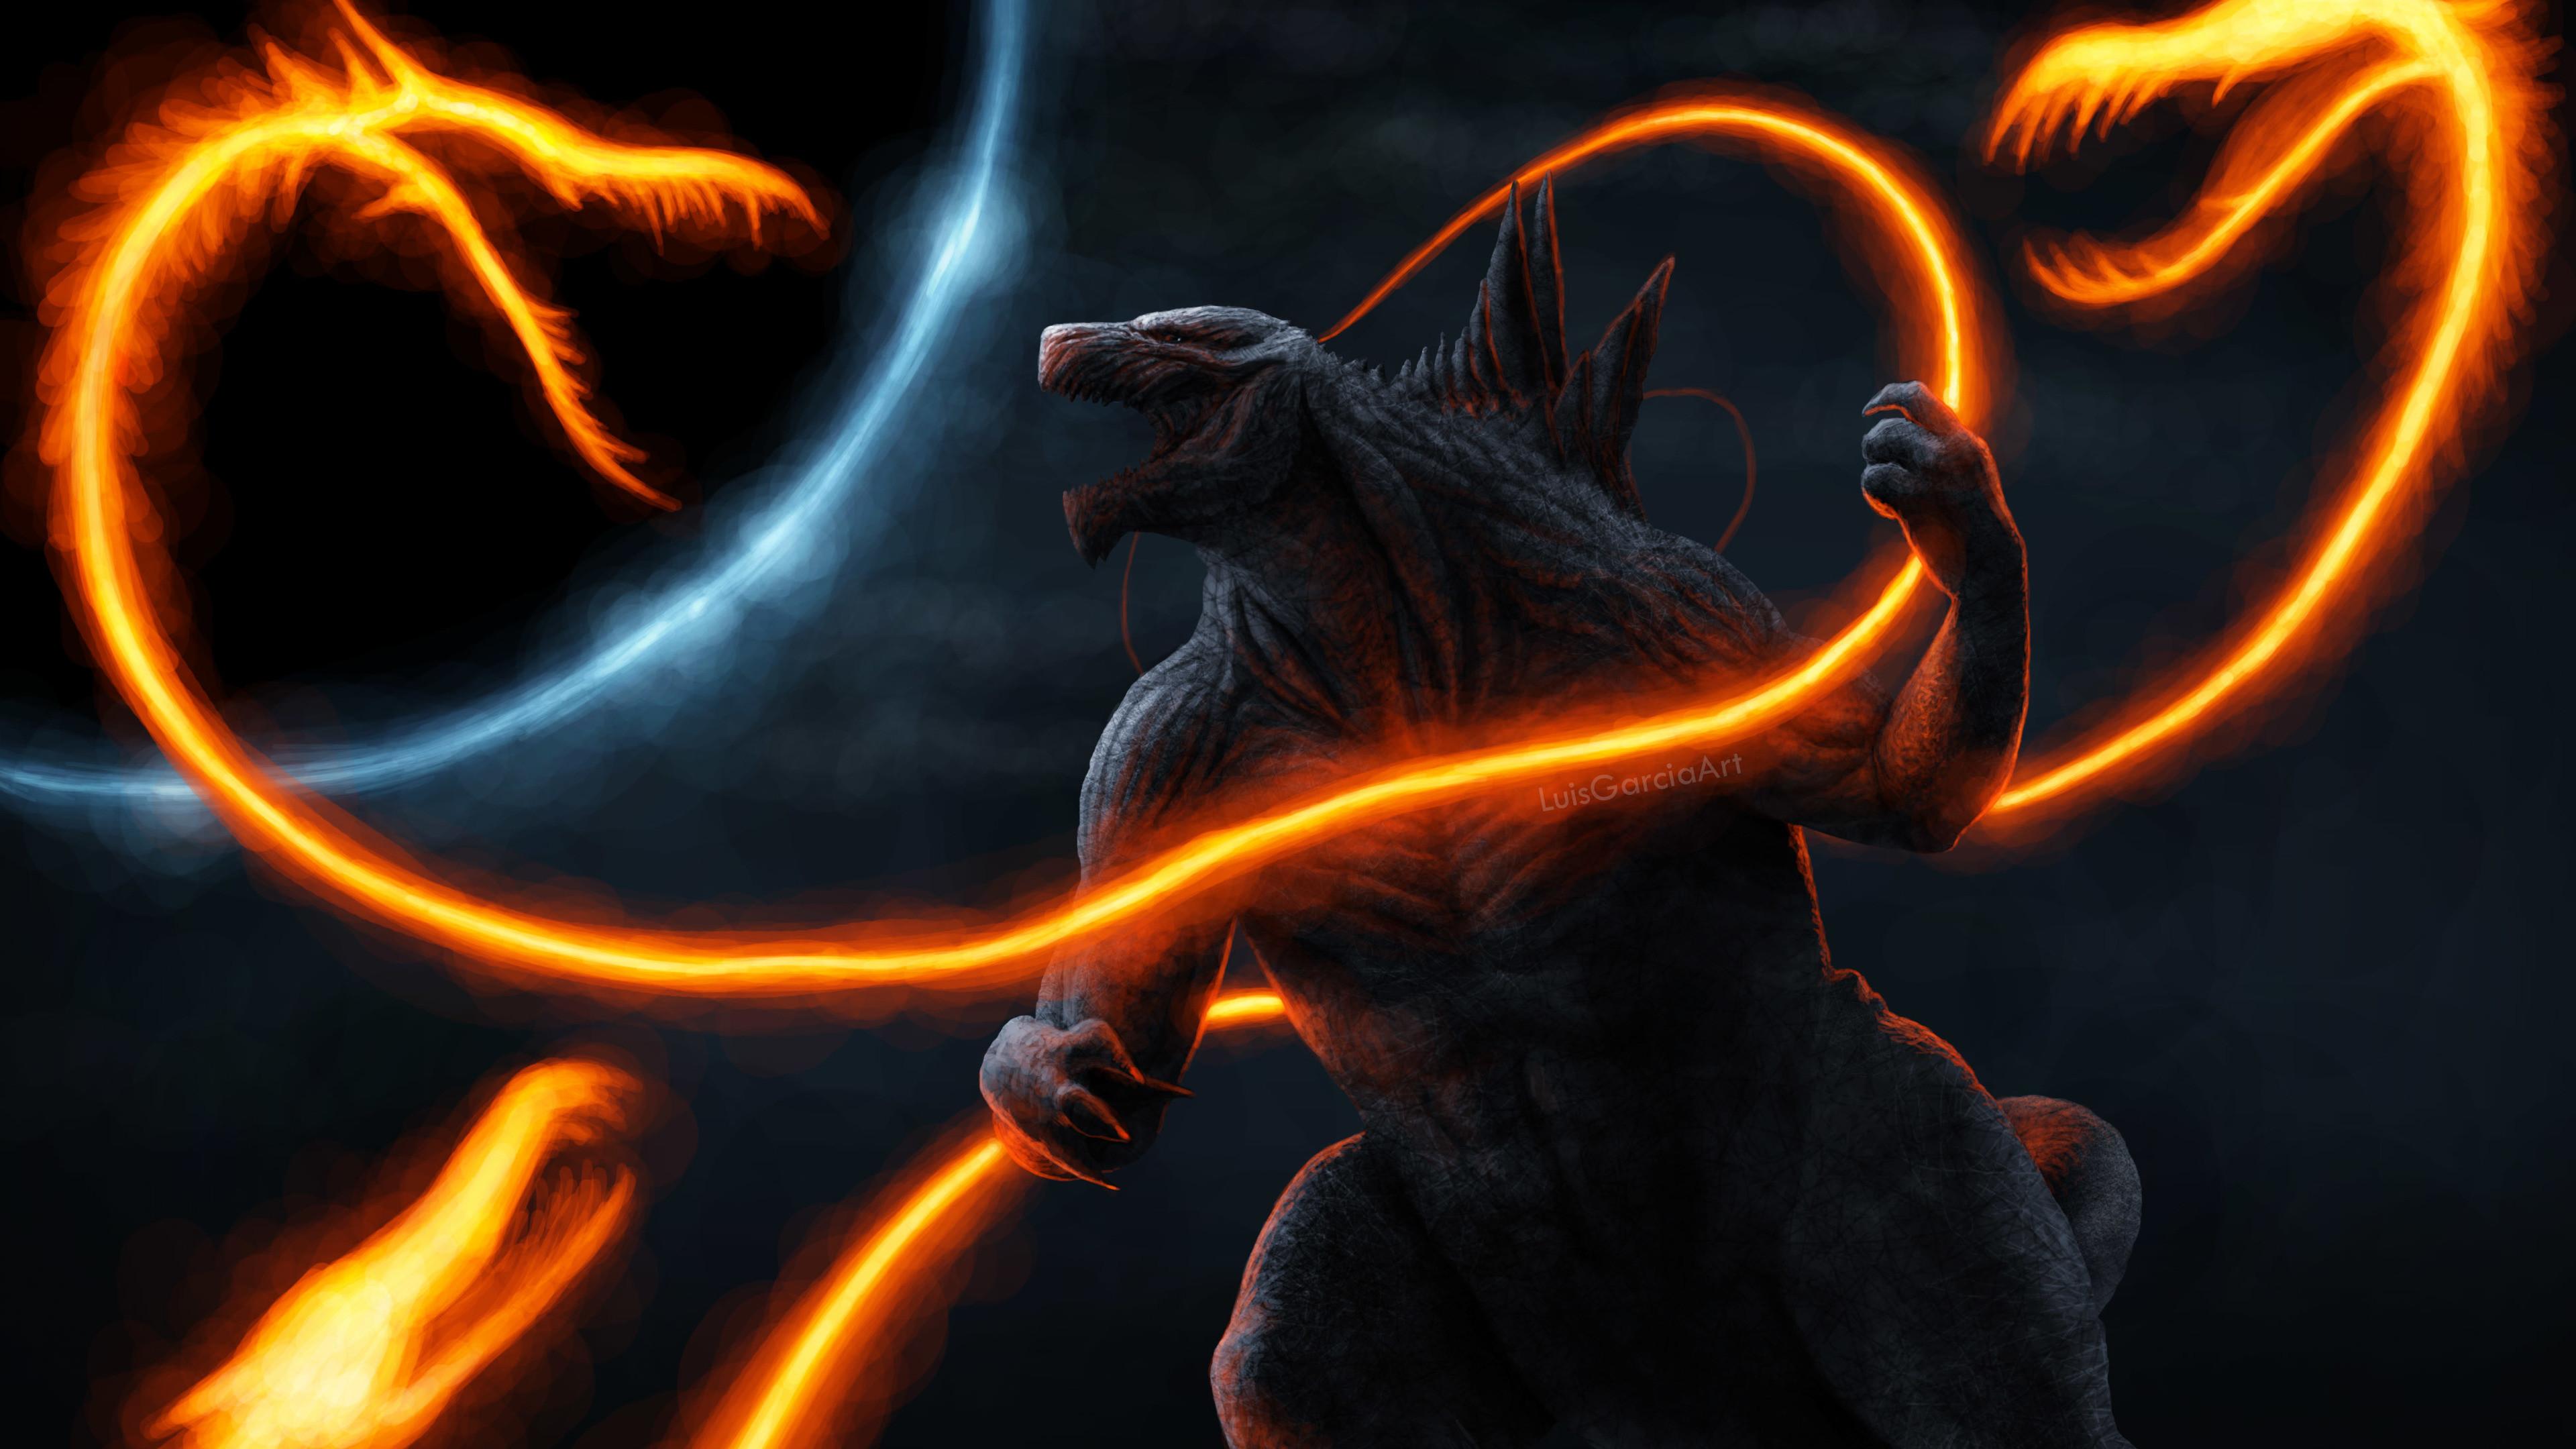 Godzilla Wallpaper Images (82+ images)